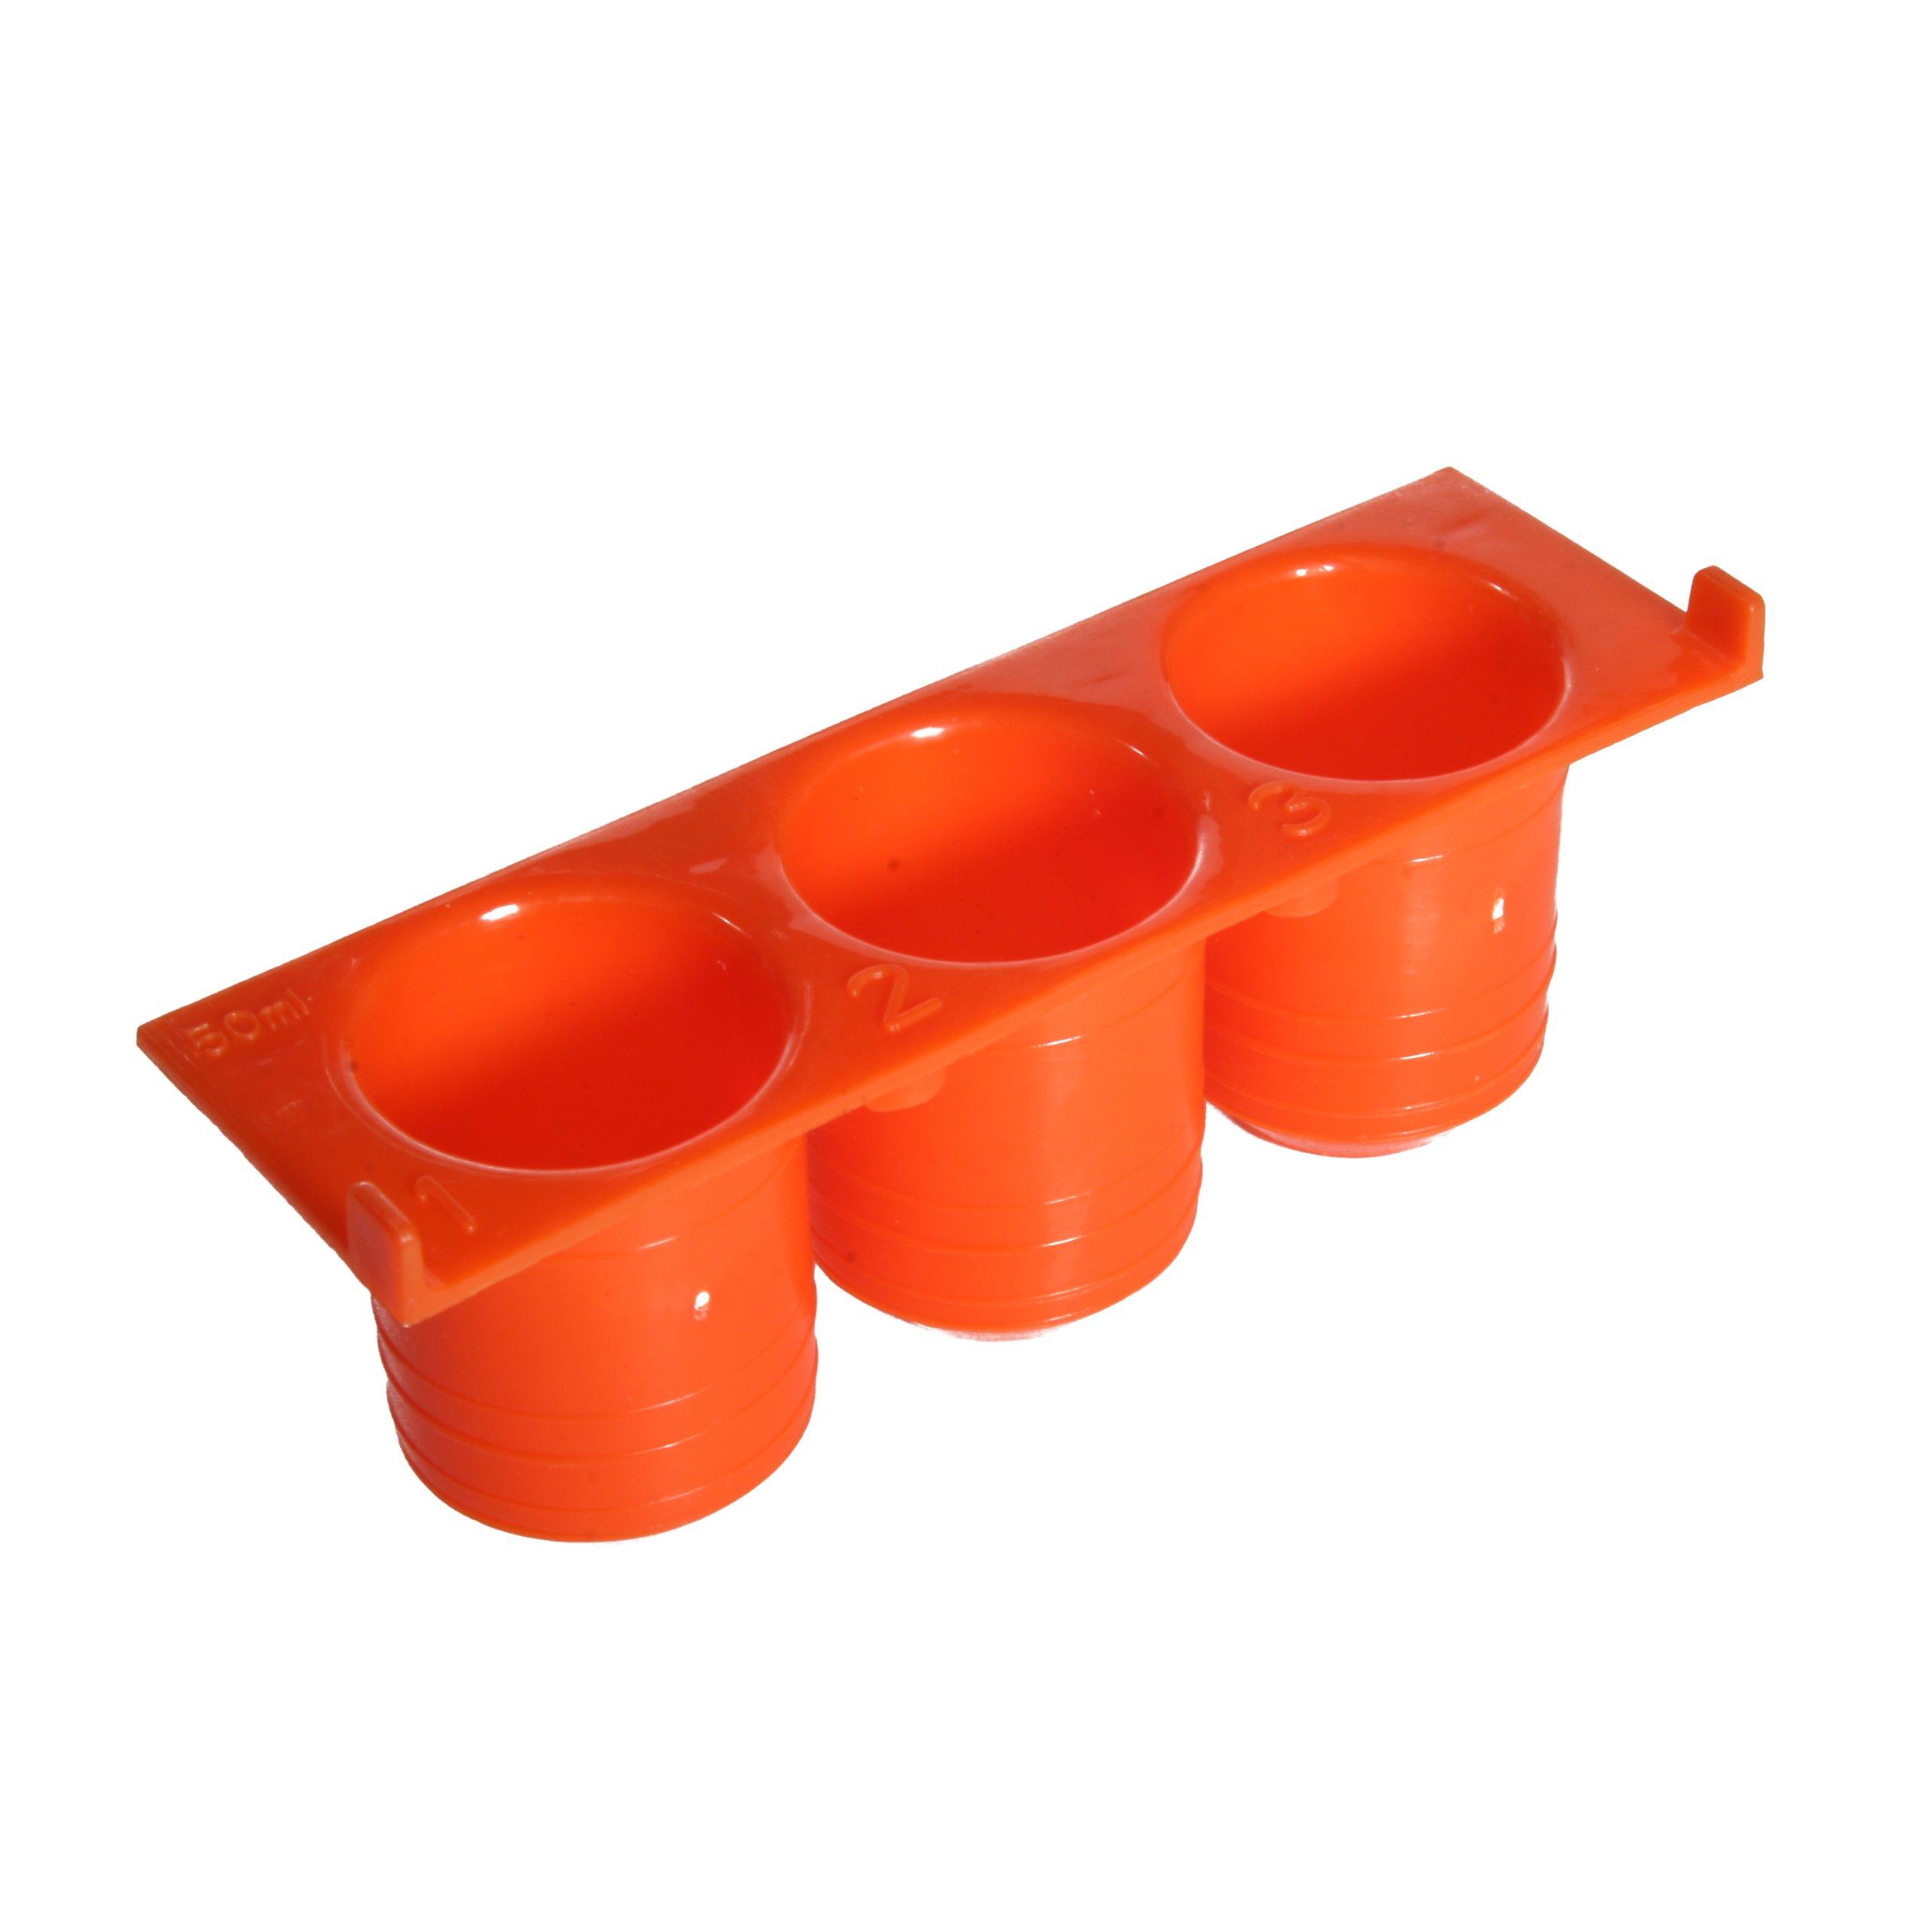 Argos R6007 Orange Polypropylene FlexiRack Pipetting Workstation Centrifuge Tubes Insert For 50mL 3 Centrifuge Tubes (Pack of 5)